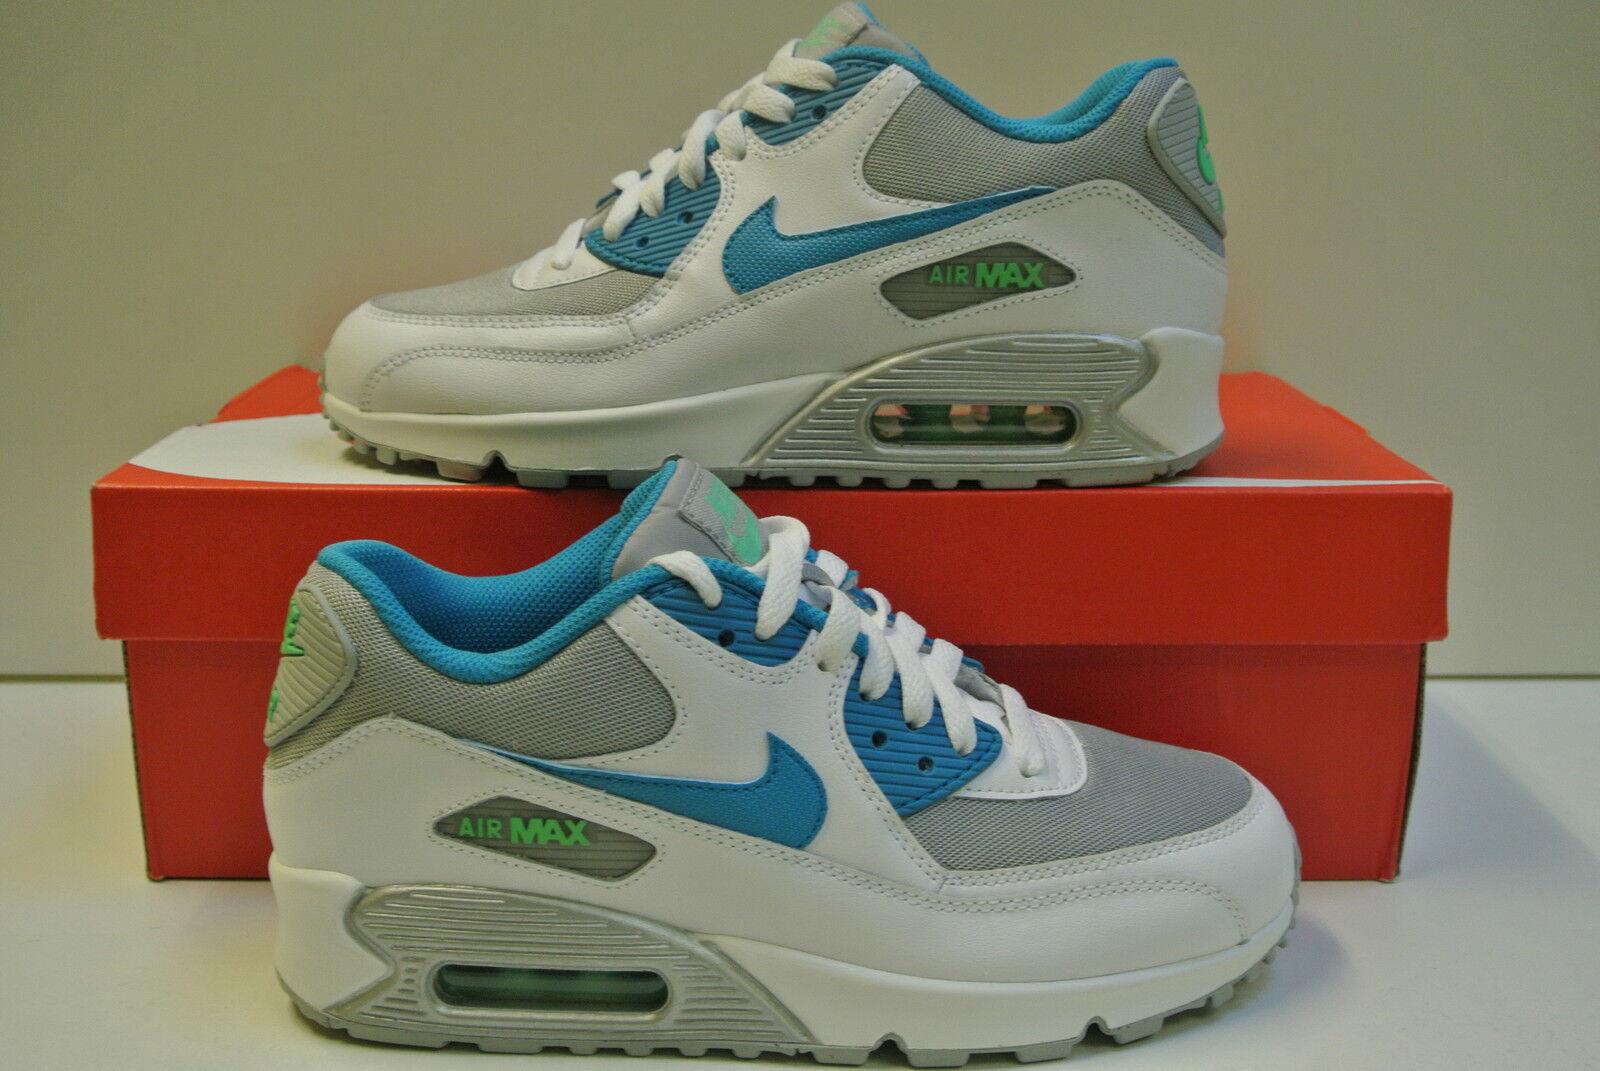 Nike Air Max 90 Mesh  Gr. Neu wählbar Neu Gr. & OVP 724855 104 1ecf9d